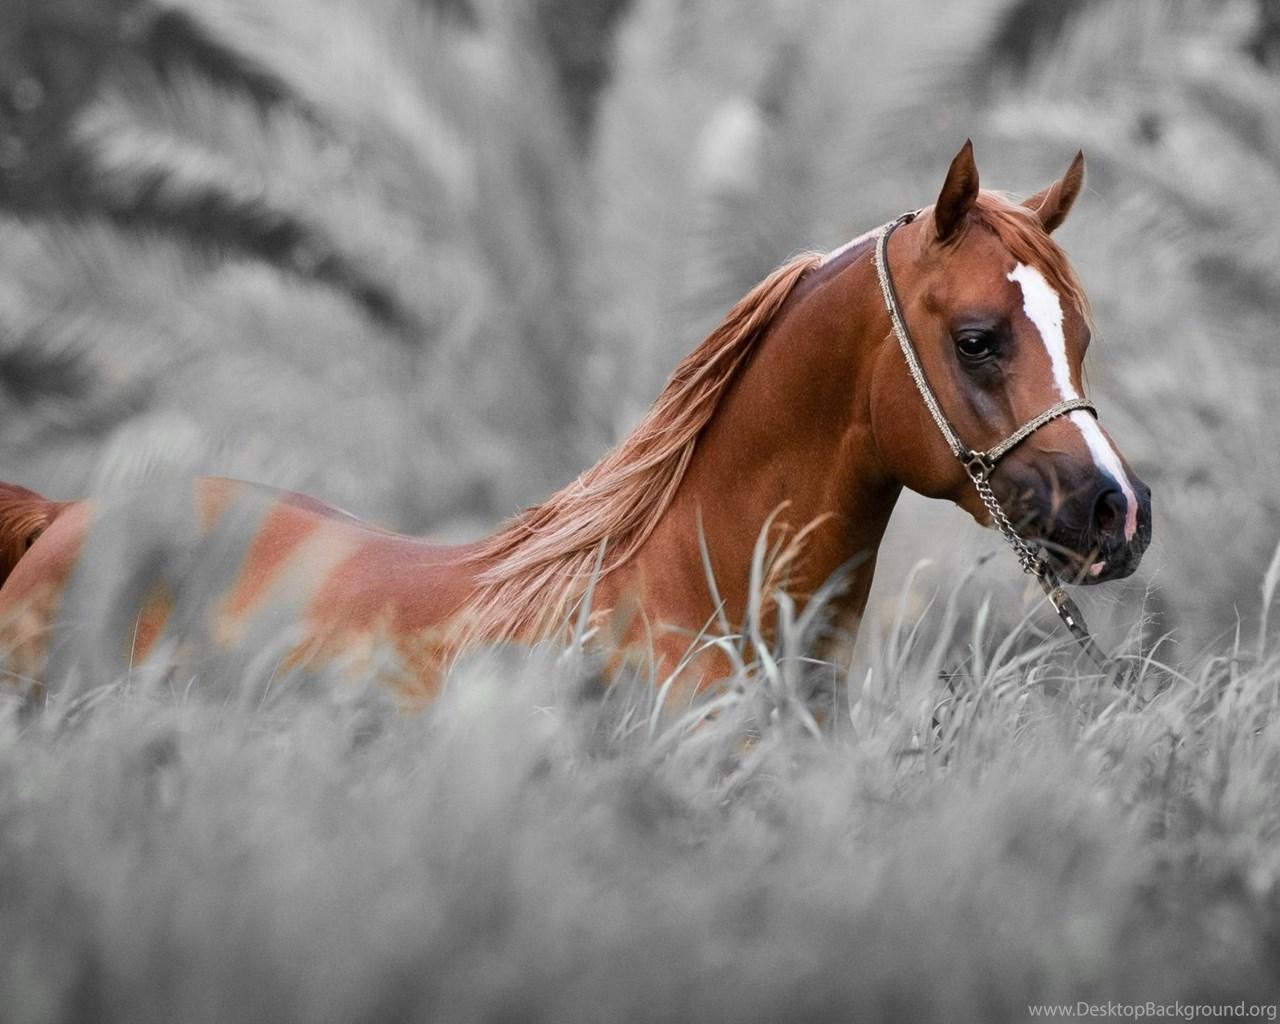 Horse Wallpapers Hdjpg Desktop Background